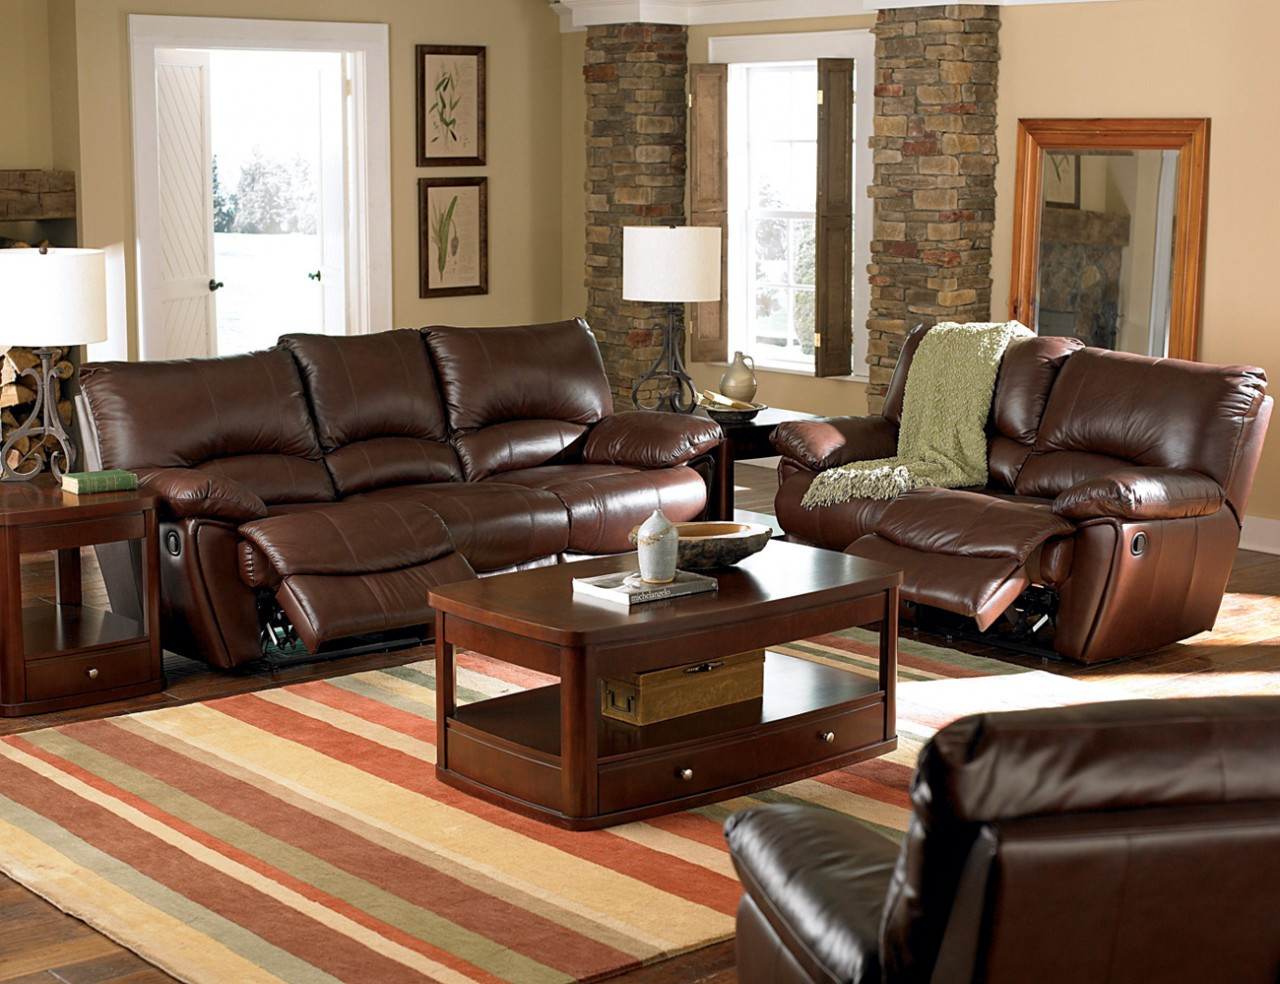 C600281 - Mansi Dark Brown Leather Match Motion Reclining Sofa & Love Seat